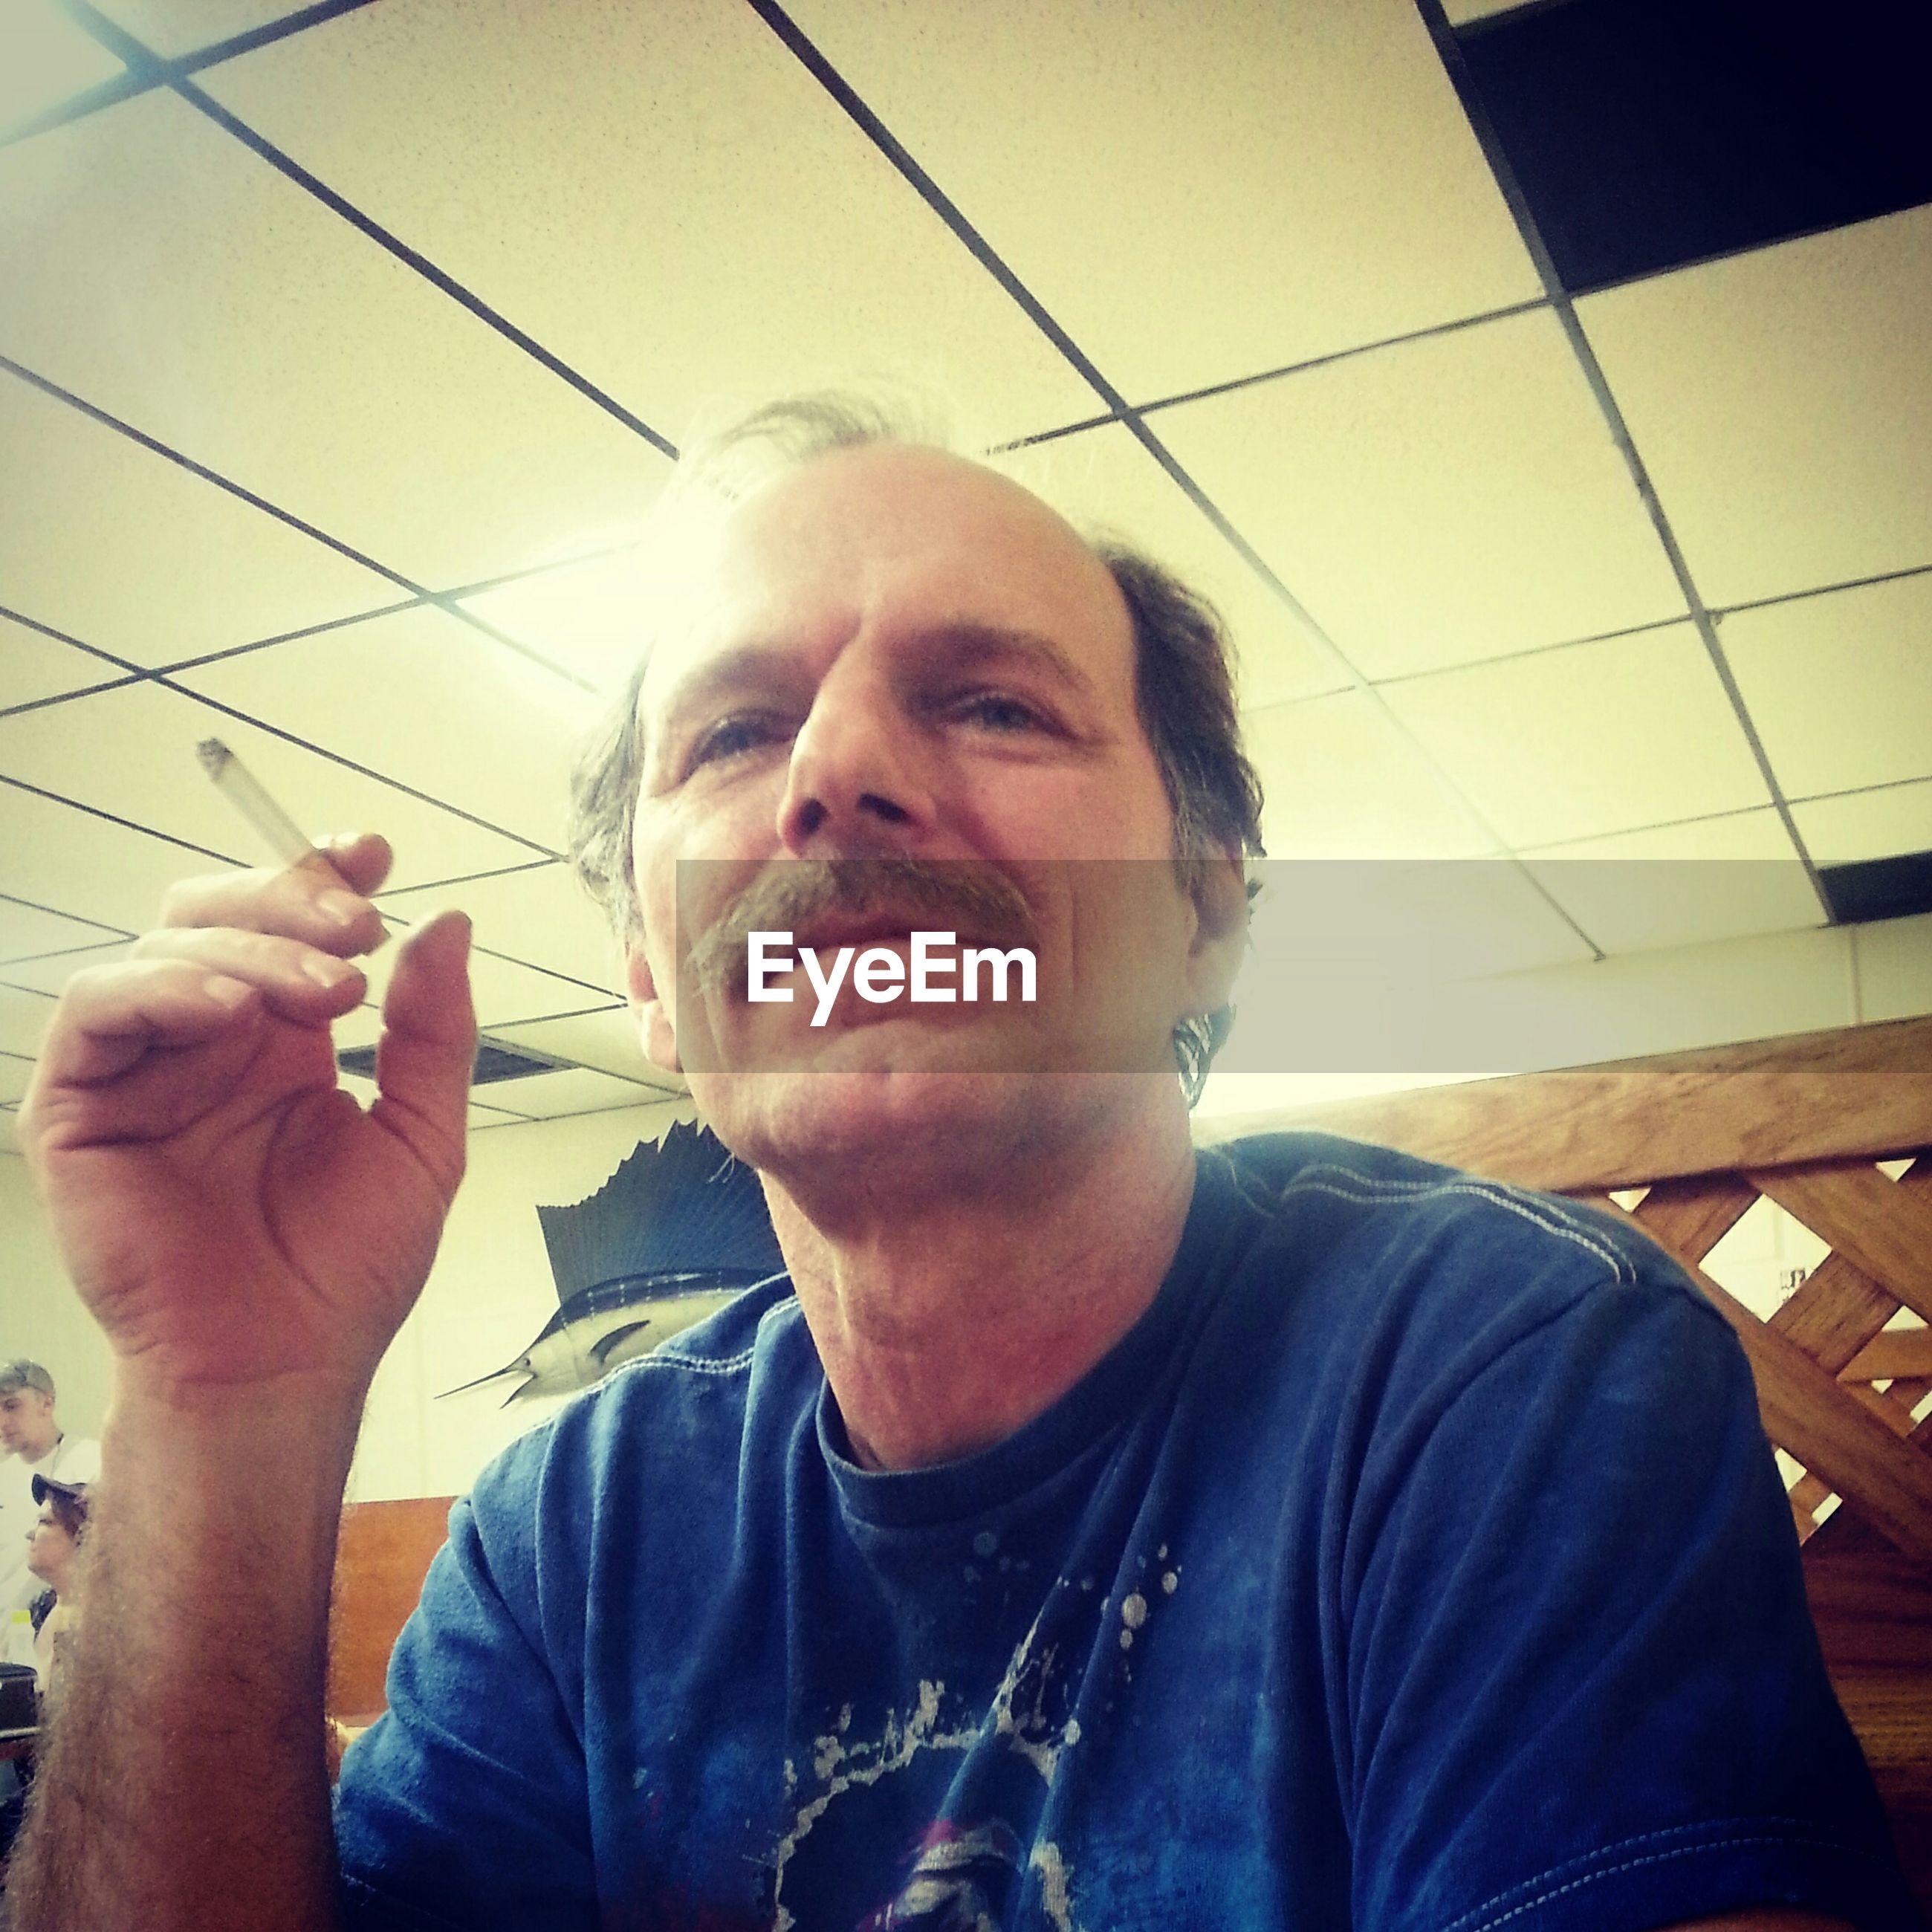 Mature man holding cigarette in restaurant